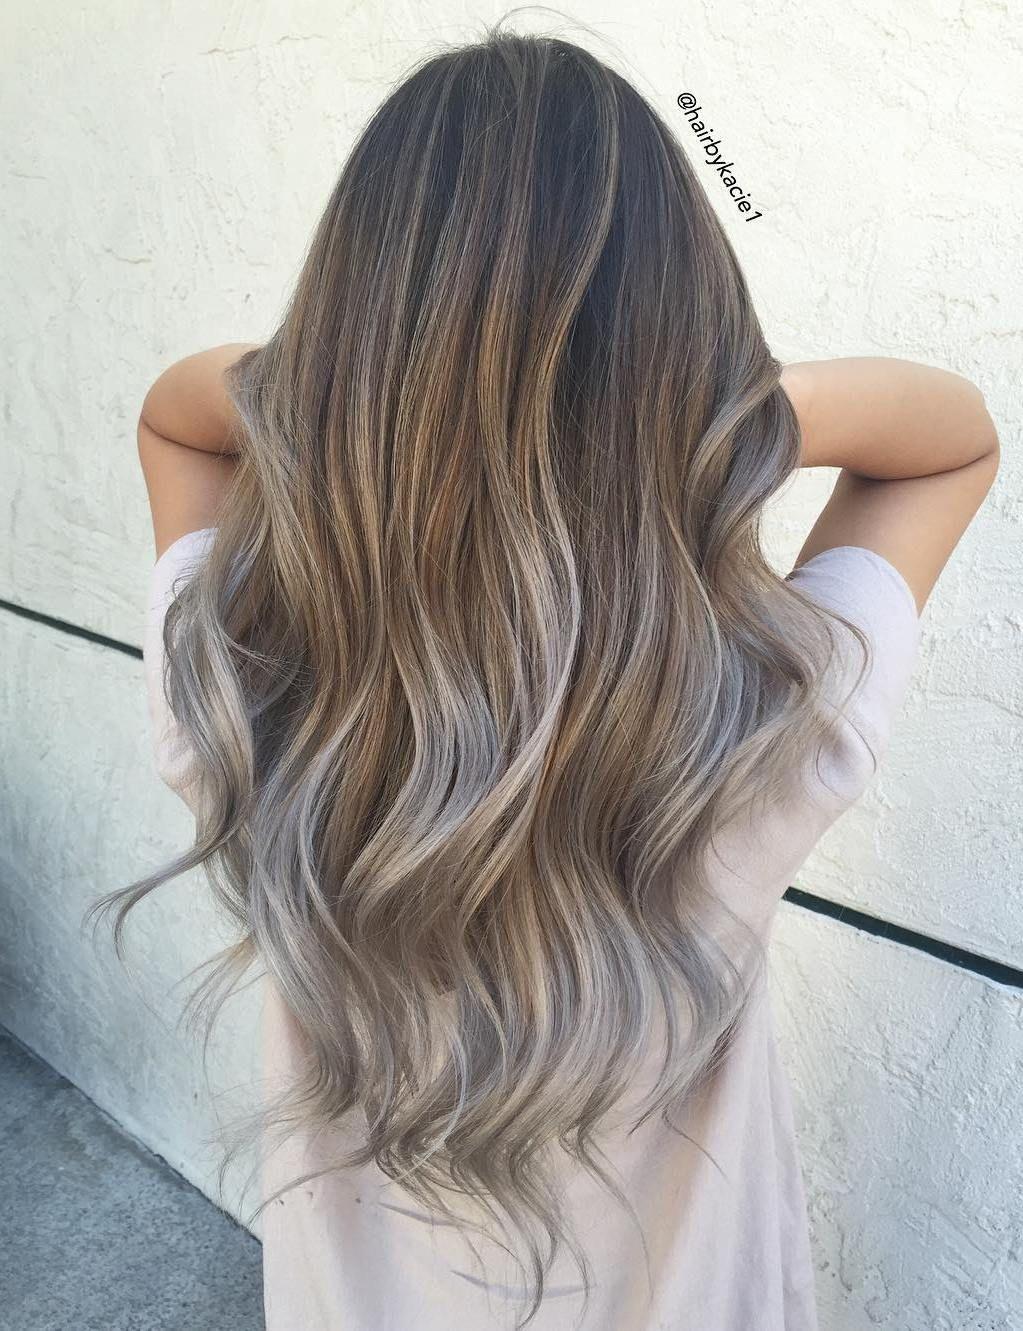 Light Brown And Silver Balayage Hair Hair Styles Balayage Hair Hair Color Balayage